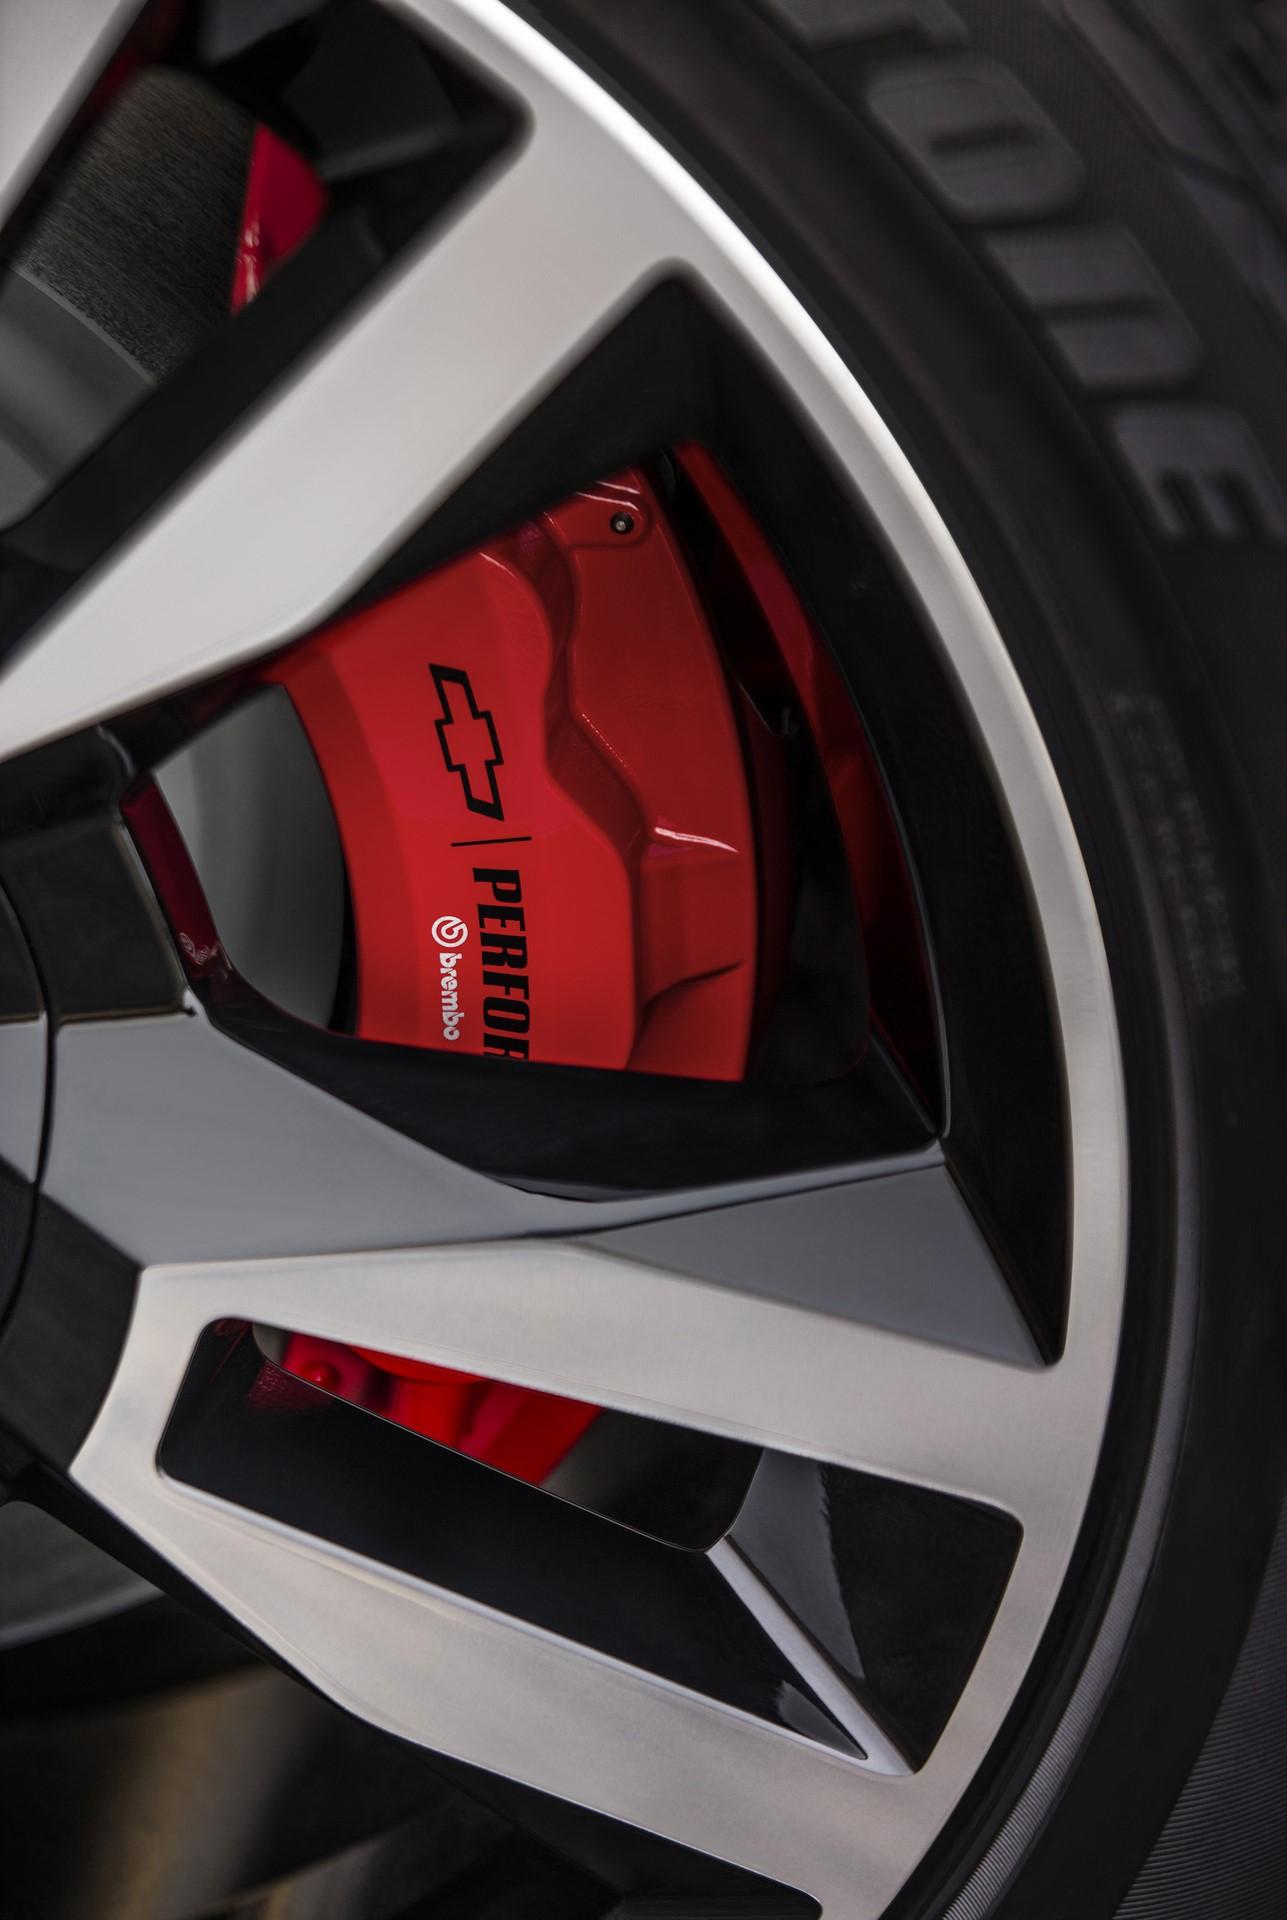 2018 Chevrolet Tahoe RST Brembo brake package